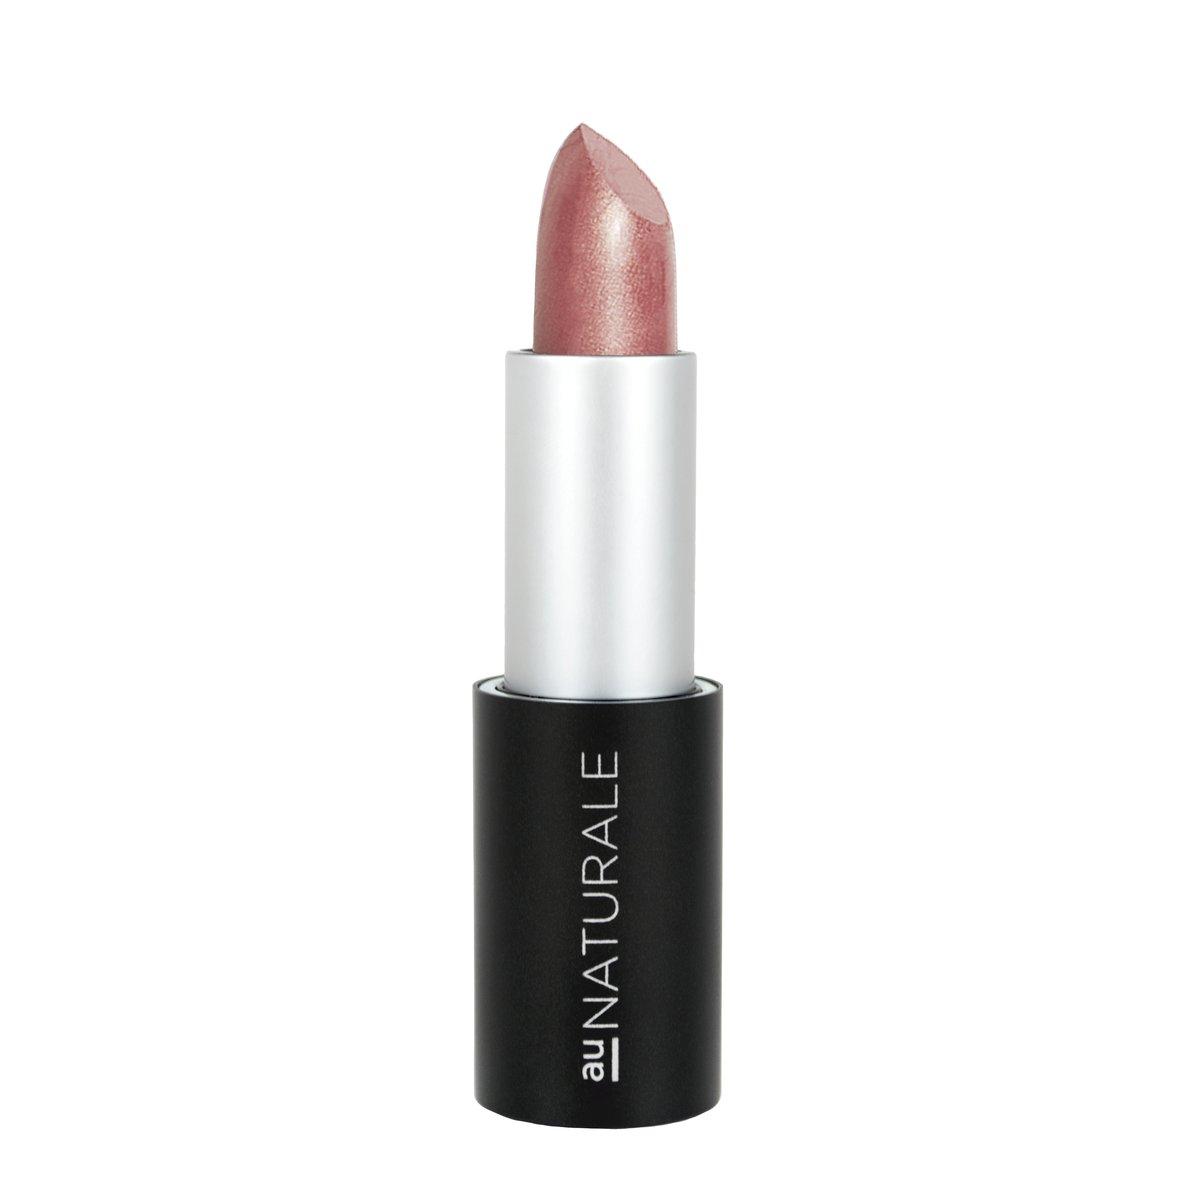 Au Naturale Eternity Lipstick - GH Rose Glow